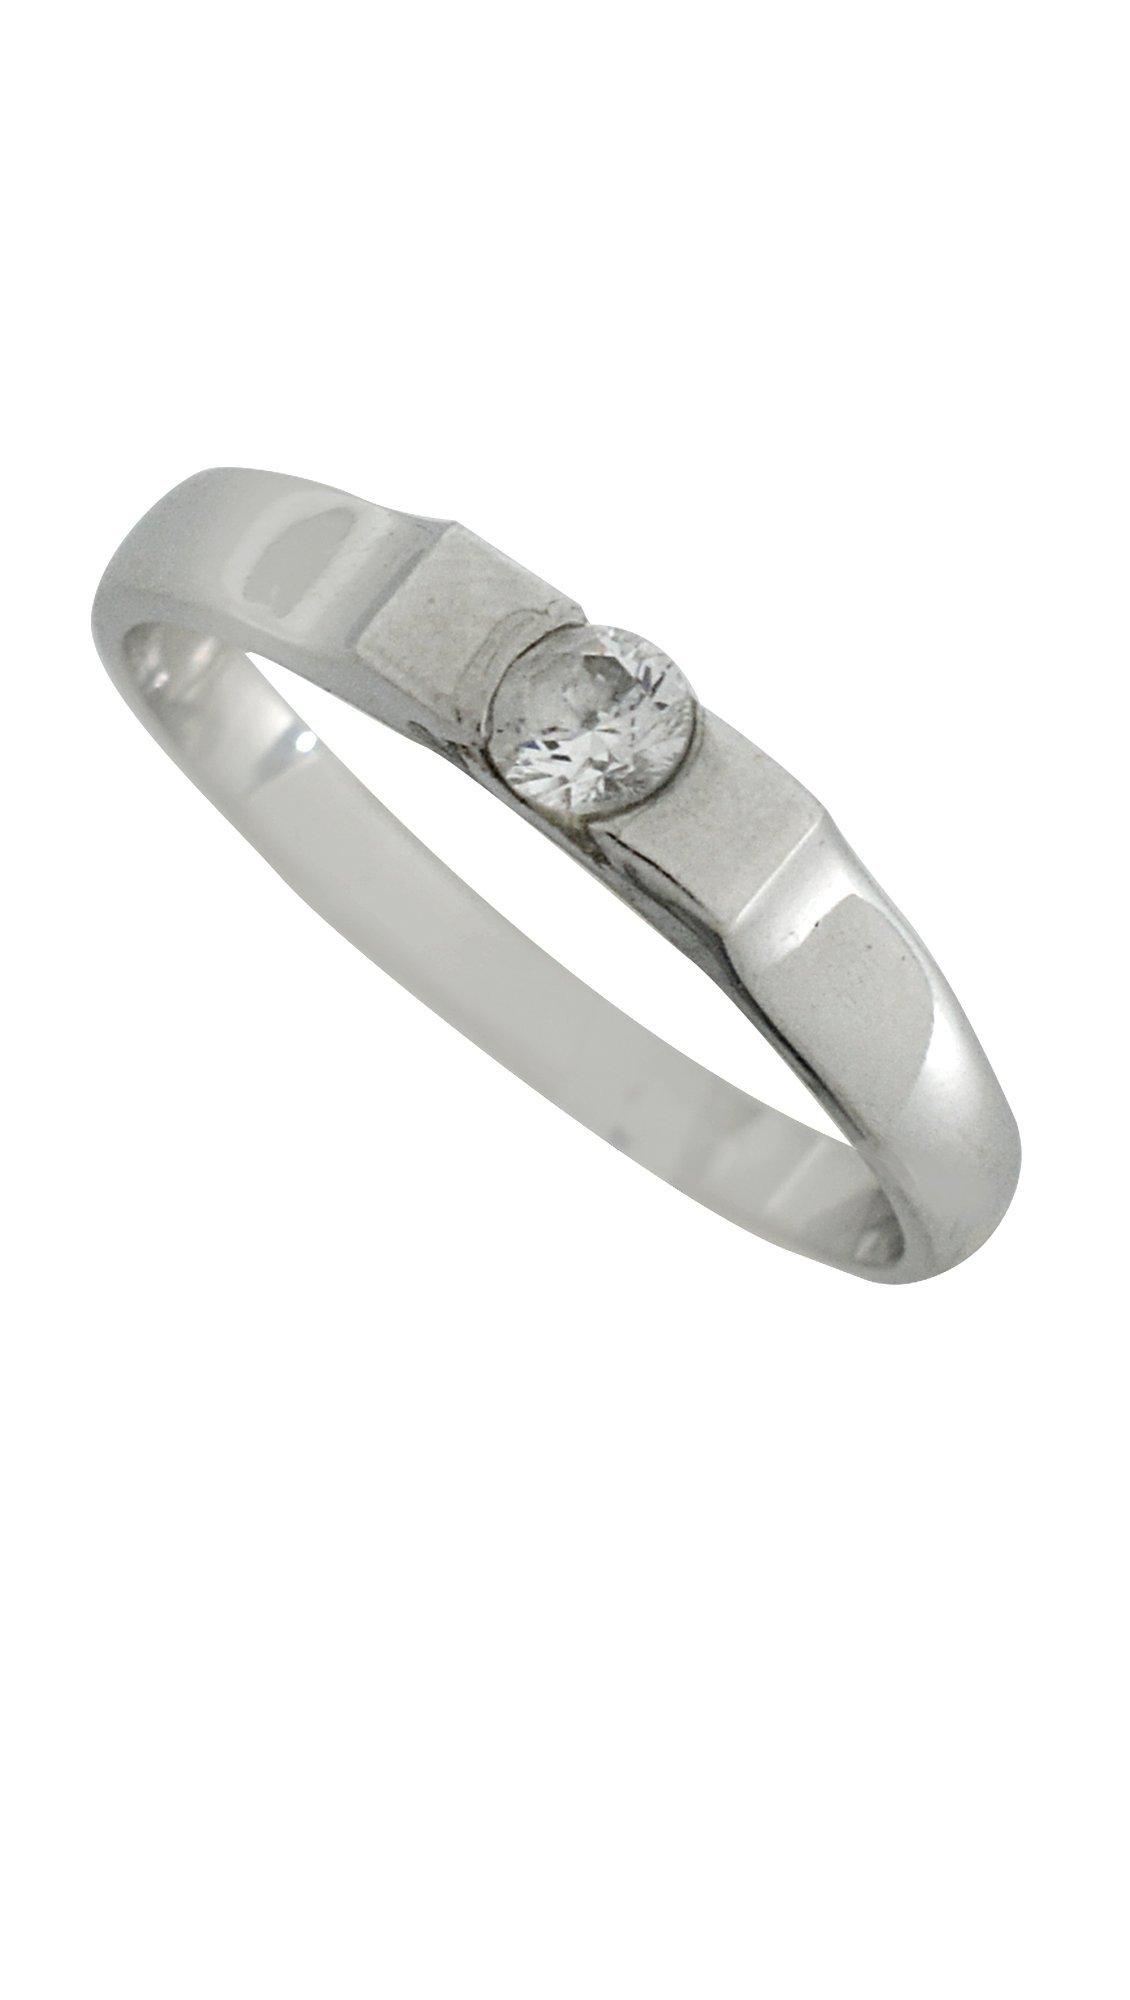 Mertzios.gr Δαχτυλίδι μονόπετρο λευκόχρυσο 14 καράτια με ζιργκόν ... 5bc9a385b4e